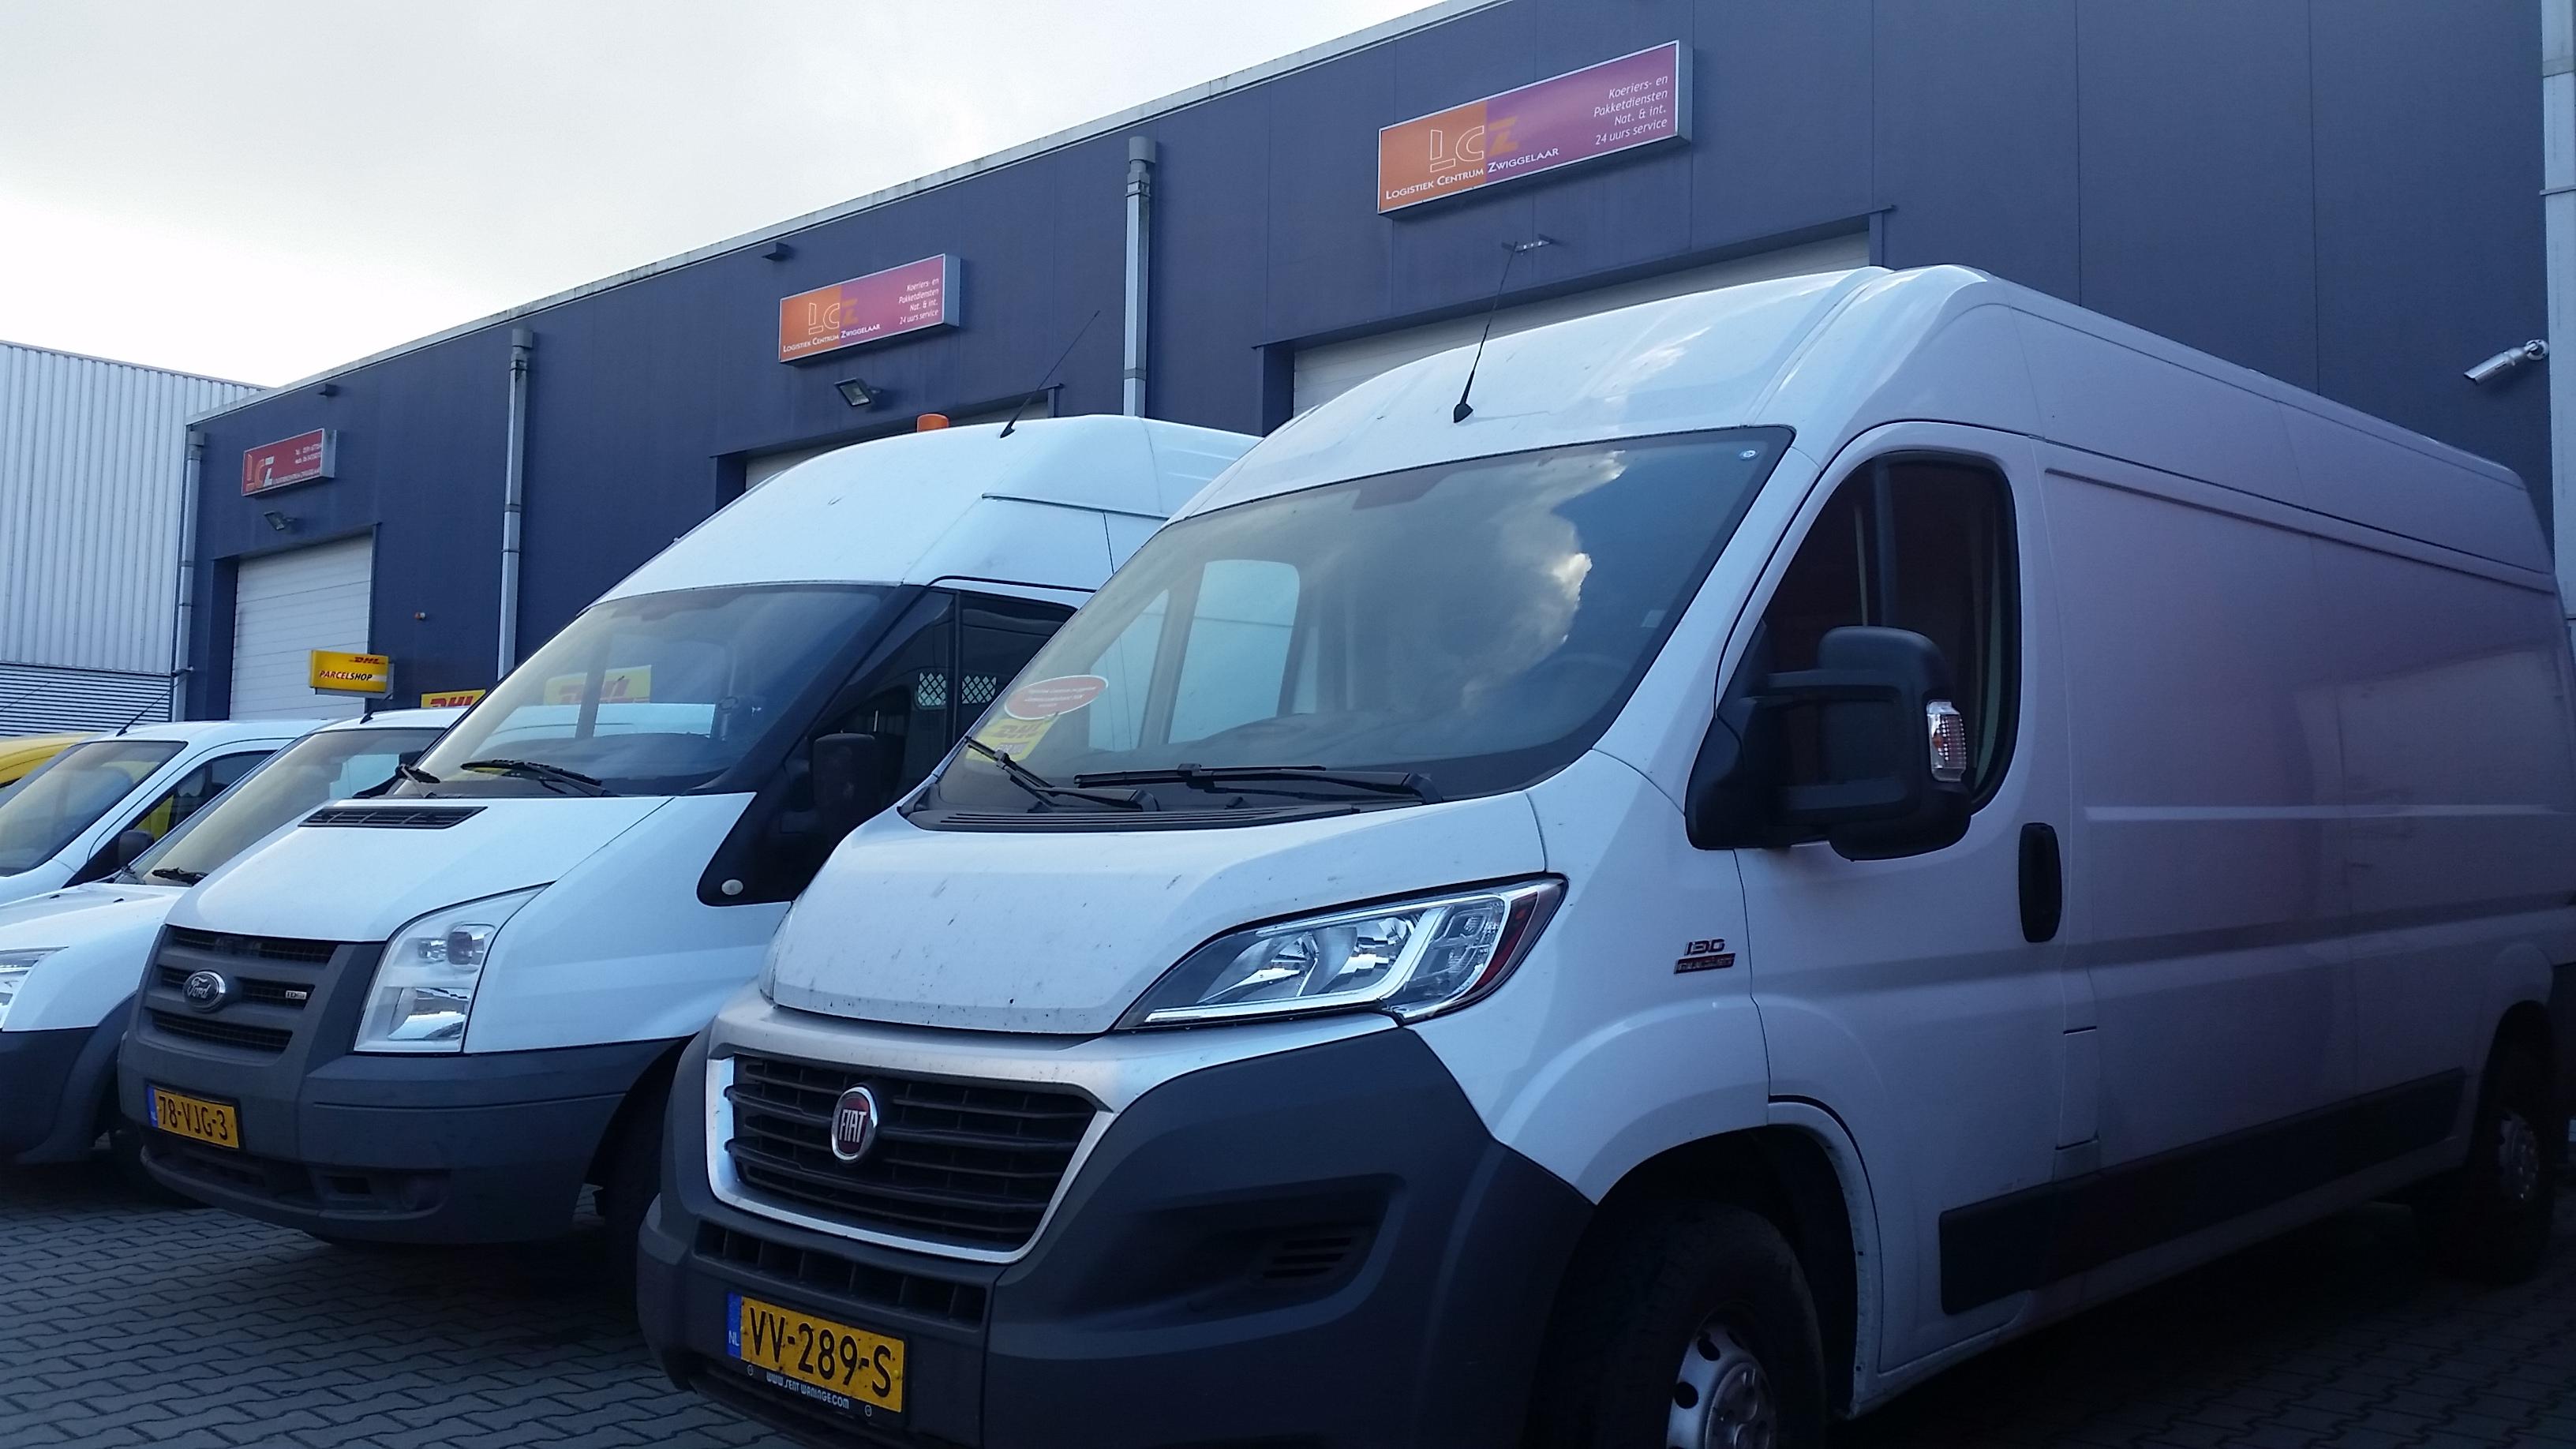 http://logistiekcentrumzwiggelaar.nl/wp-content/uploads/2016/10/bussen-logistiek-centrum-zwiggelaar.jpg